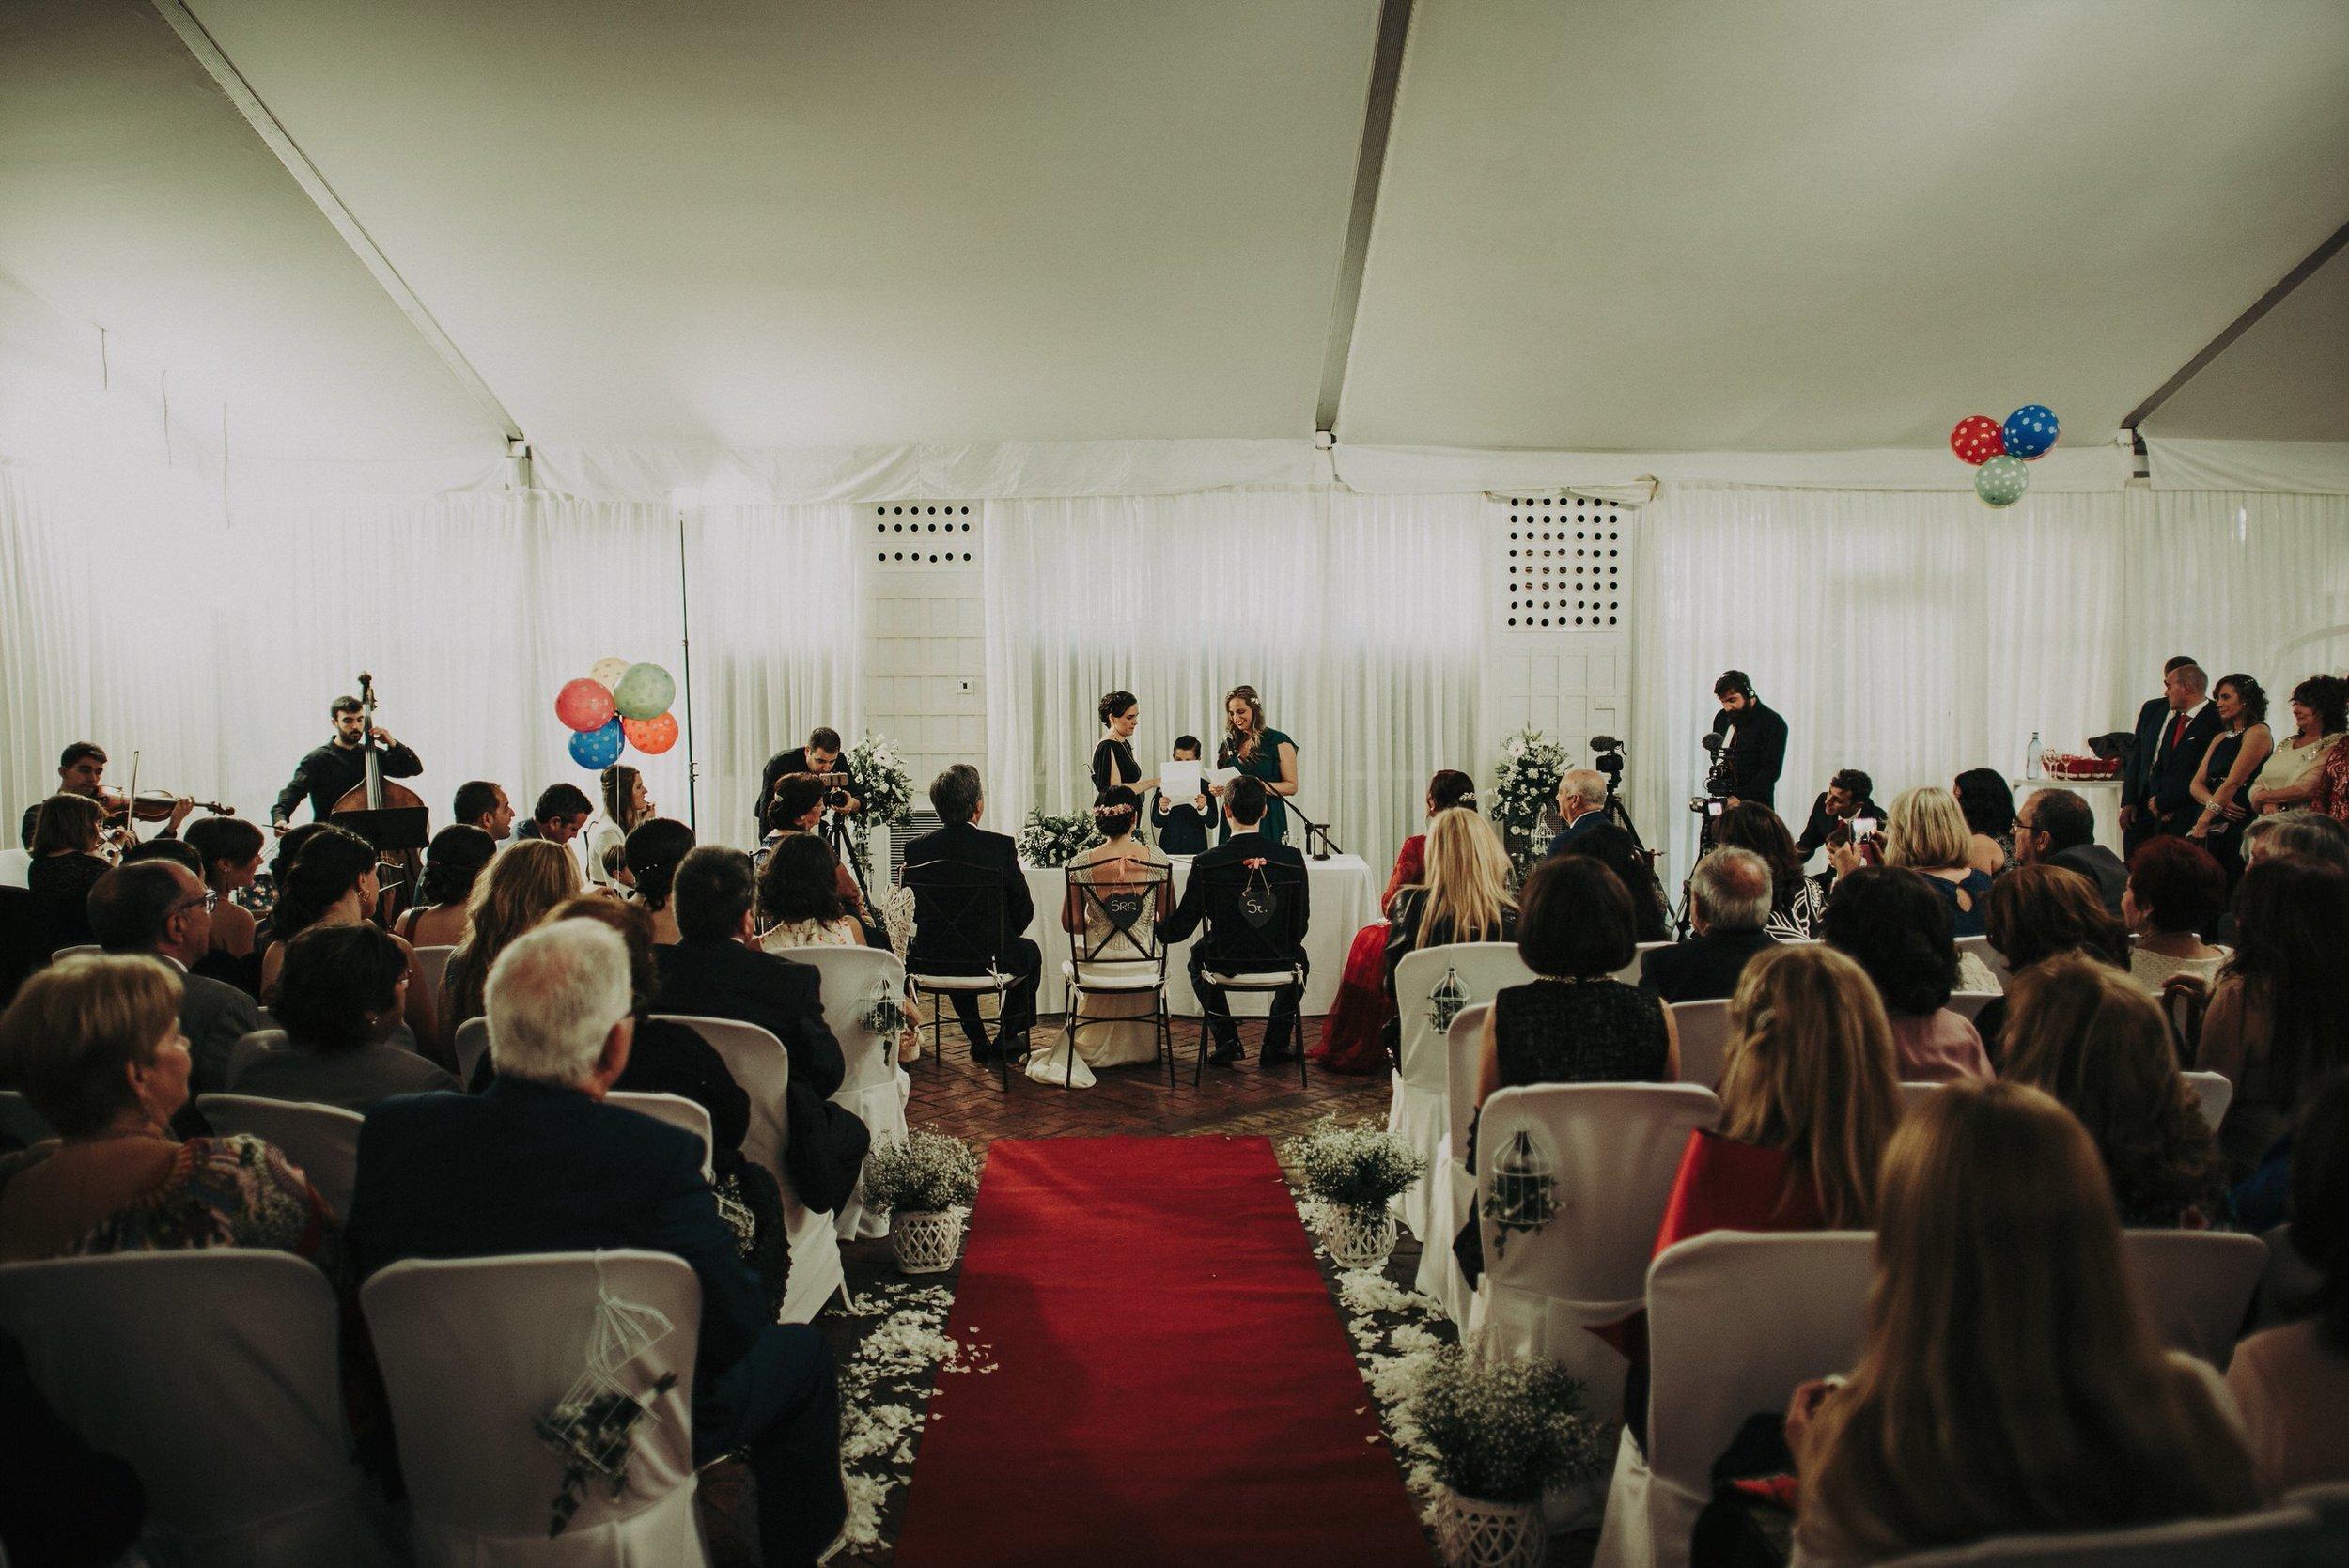 Laura & Rubén - boda en utrera - Santa clotilde- Manolo mayo - Fotografo de boda - Andrés Amarillo AAA_1075-Exposure (24).jpg